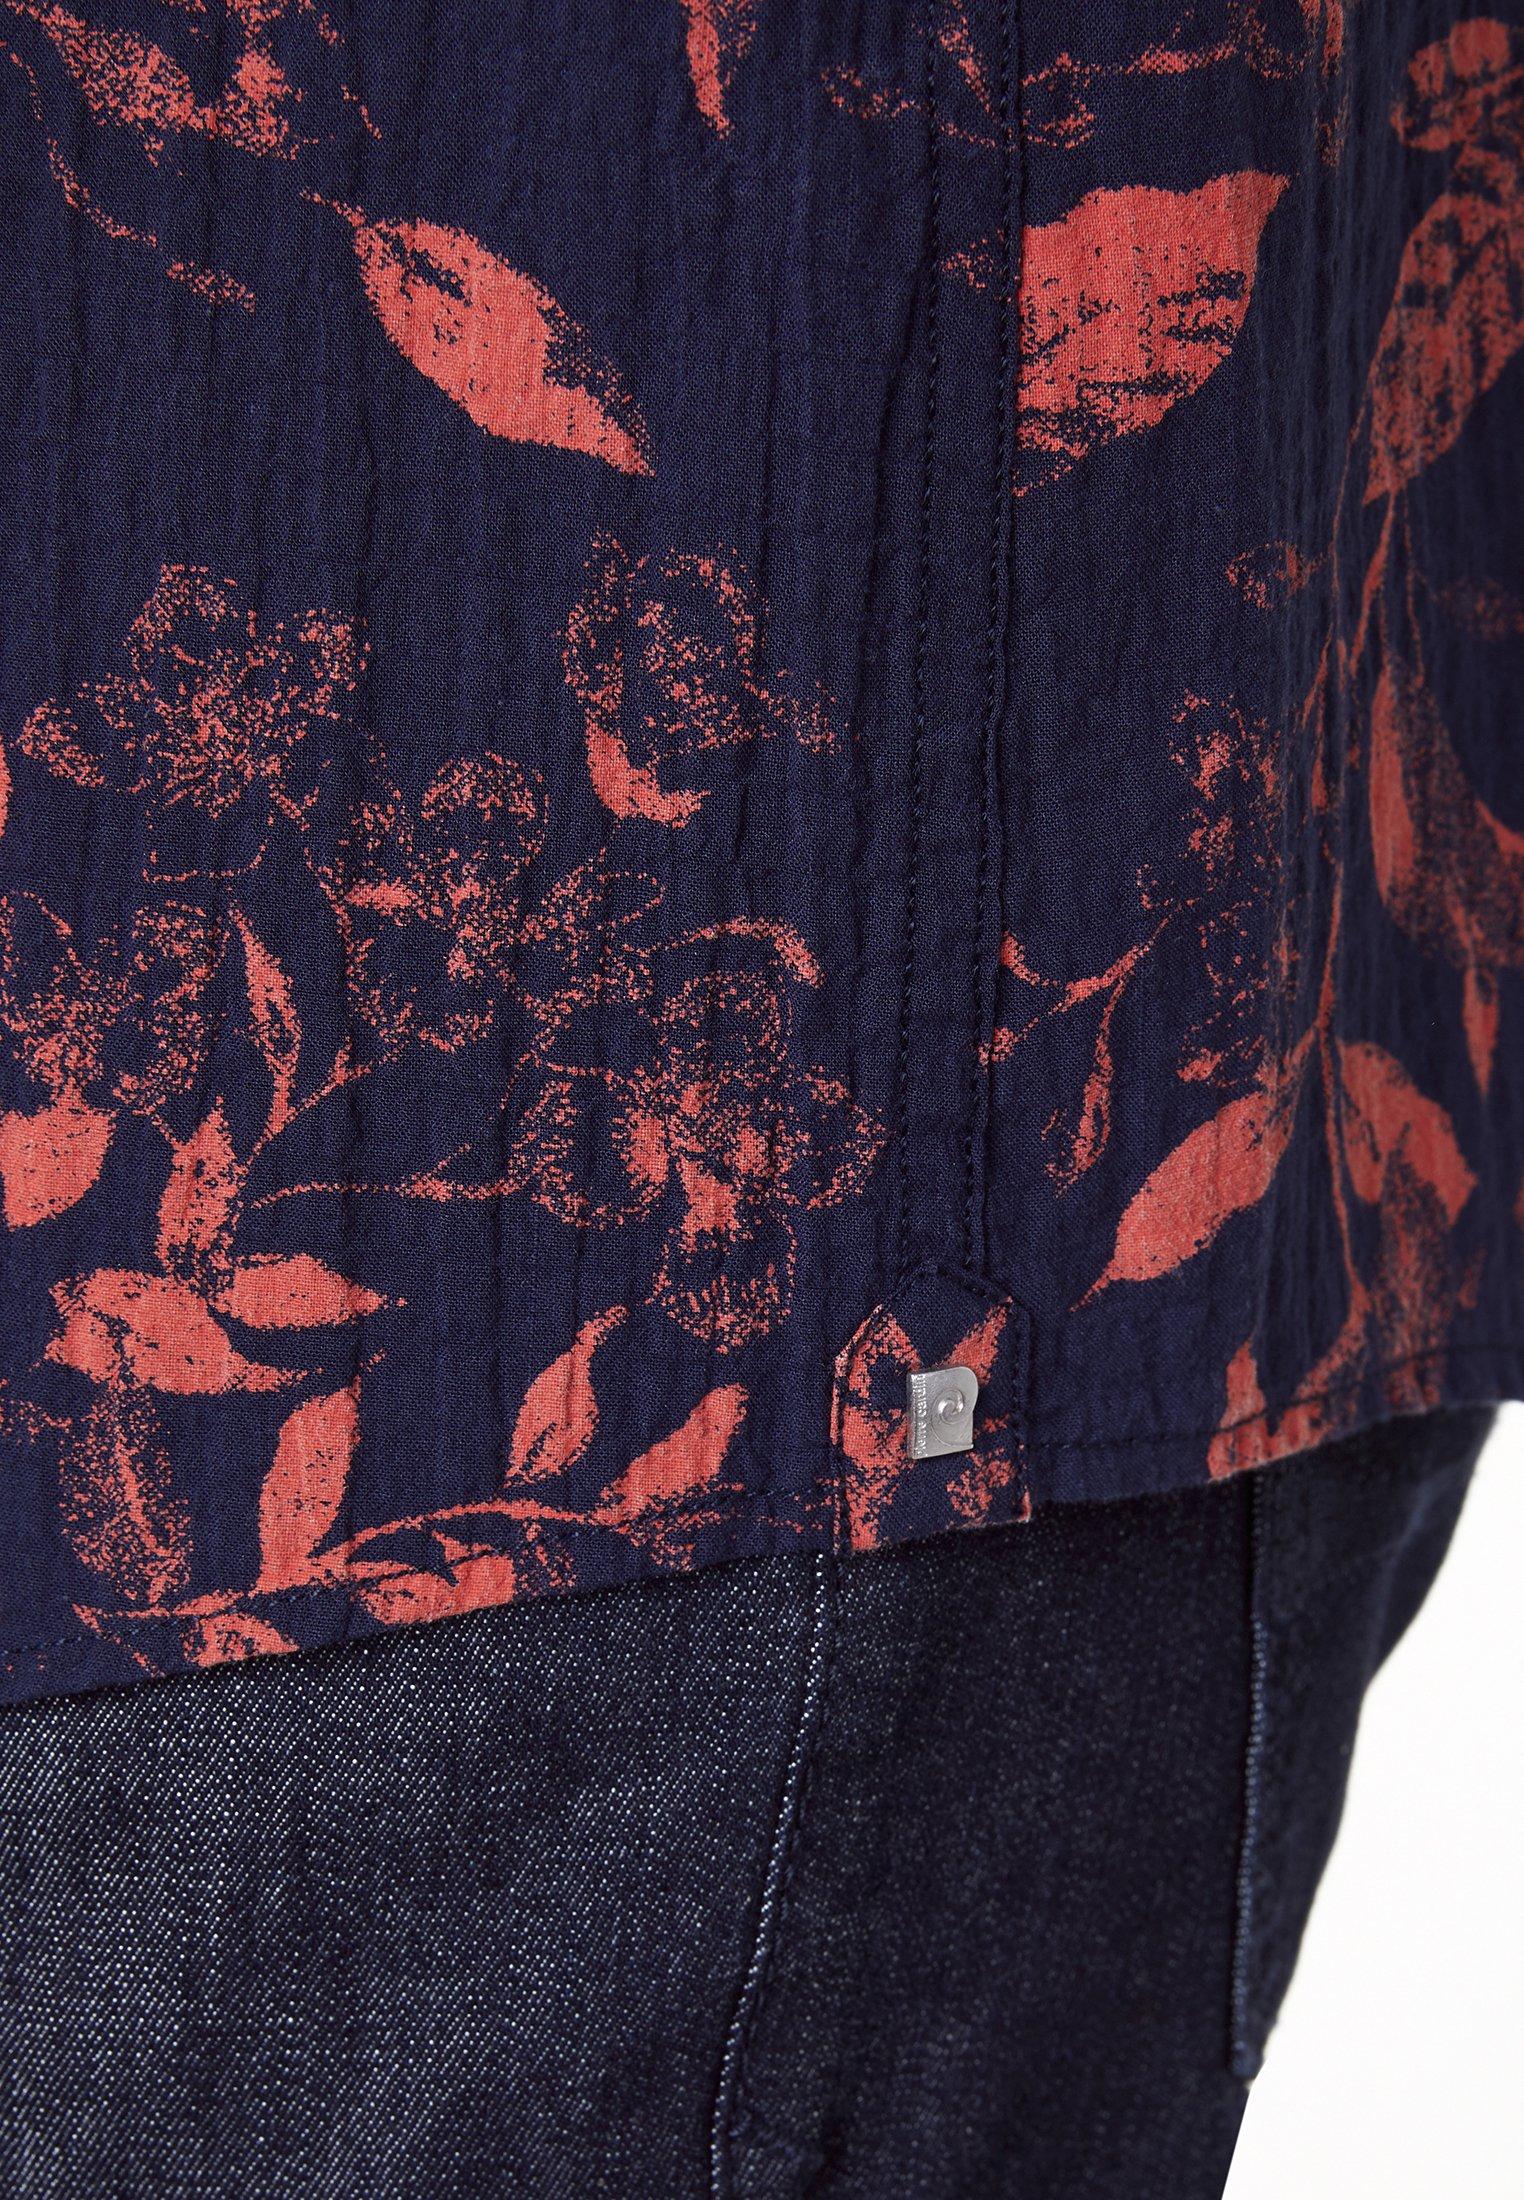 Pierre Cardin REGULAR FIT HEMD SEERSUCKER - Chemise - blau/rot